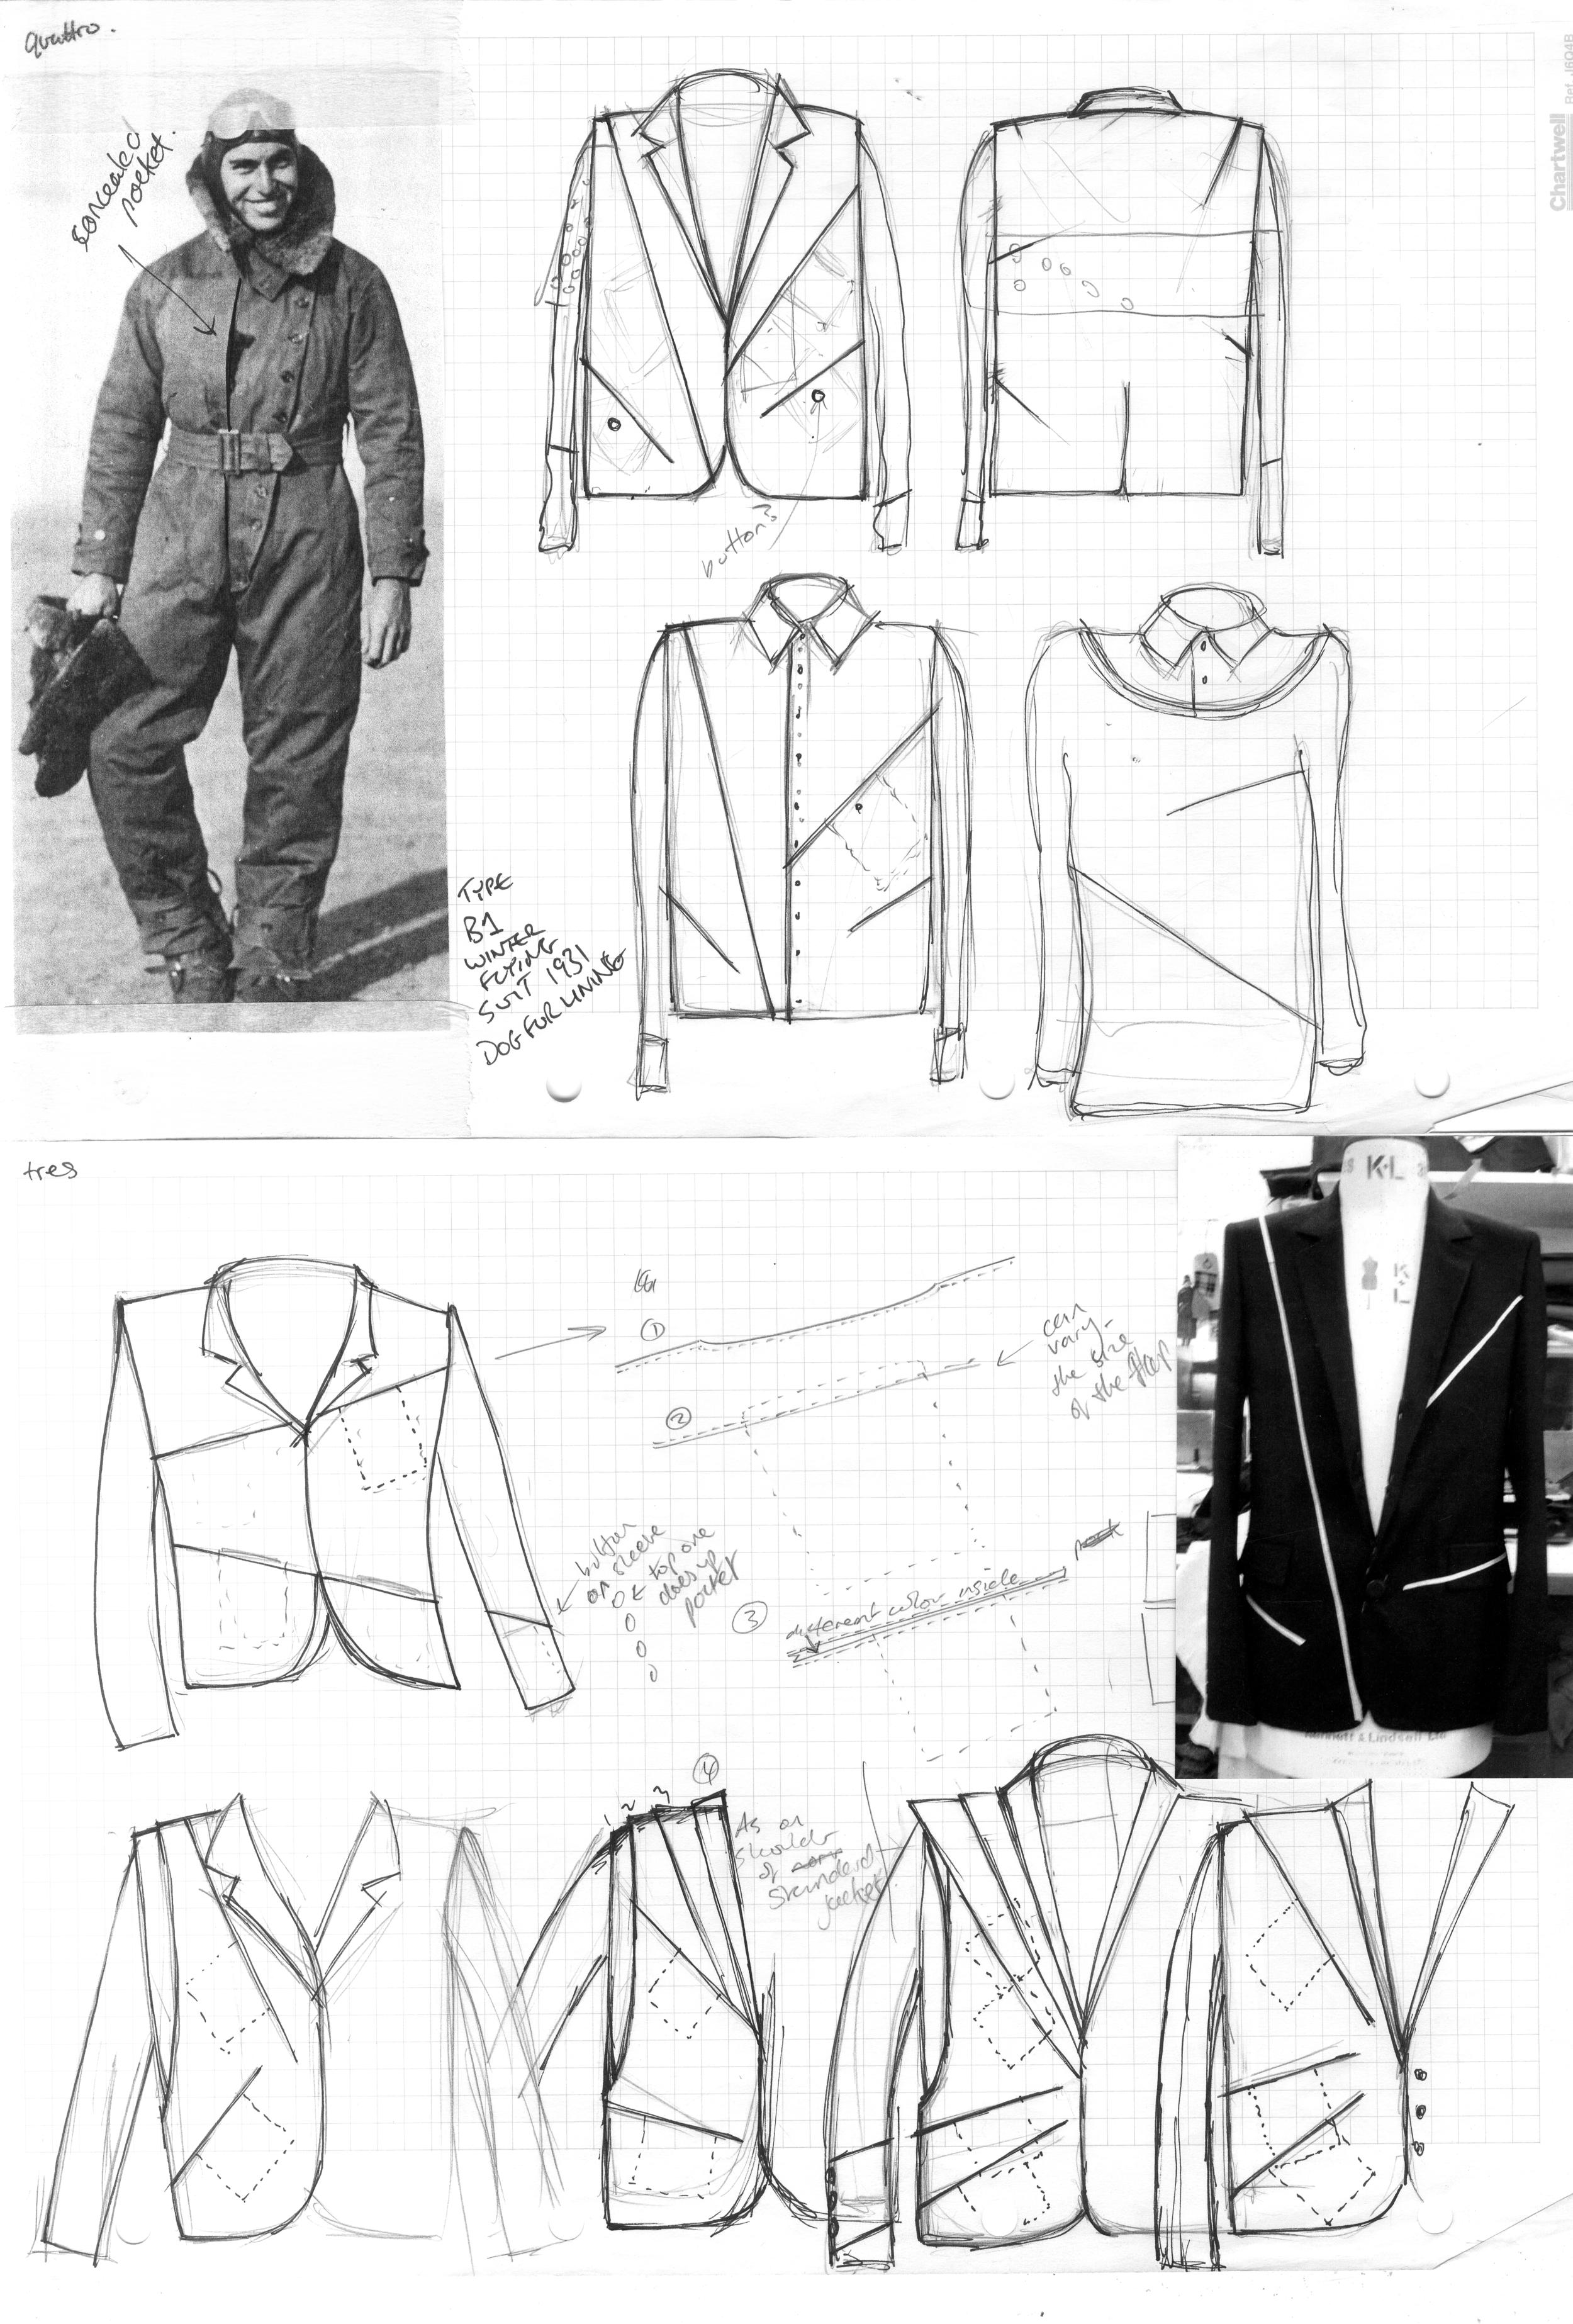 brioni sketches.png